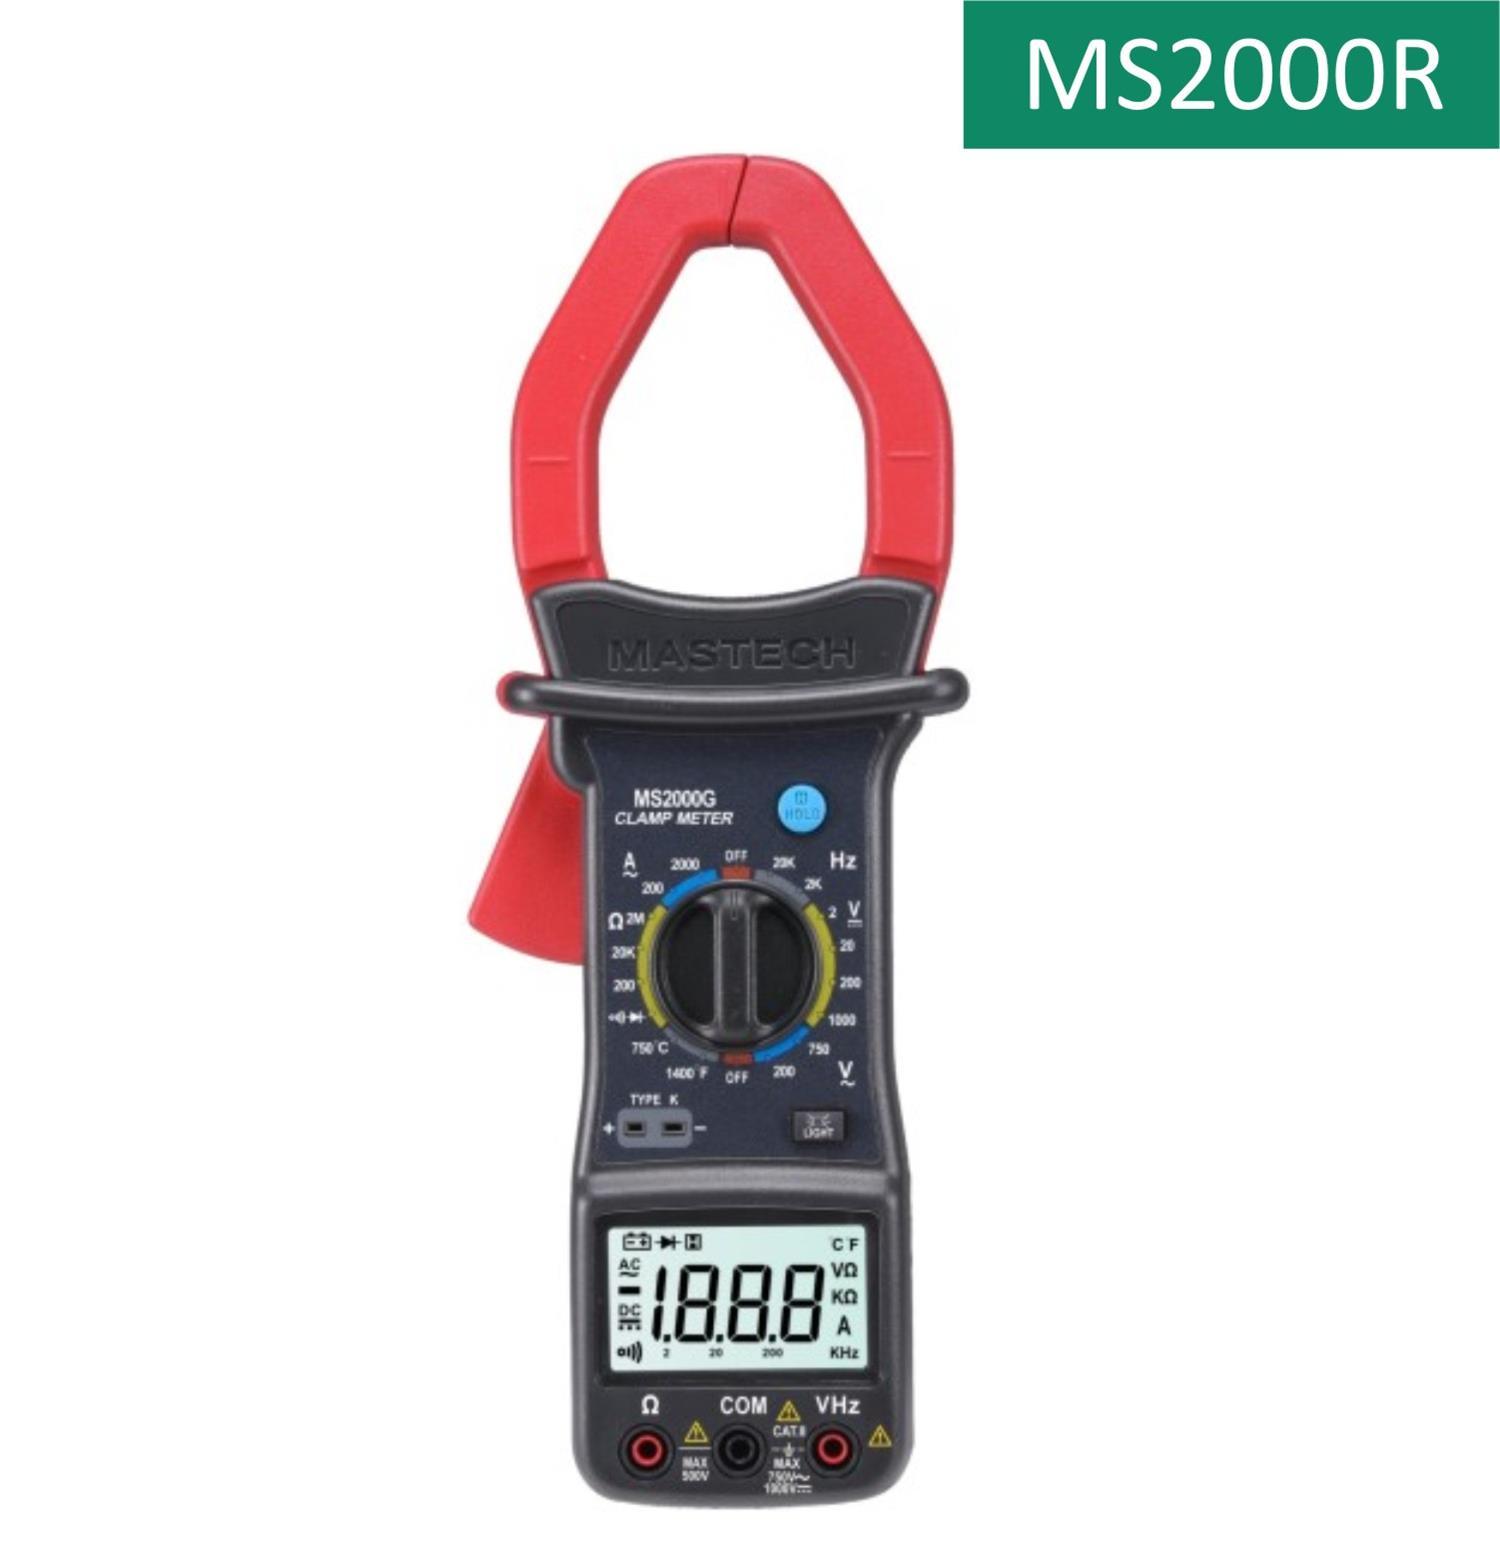 MS 2000R